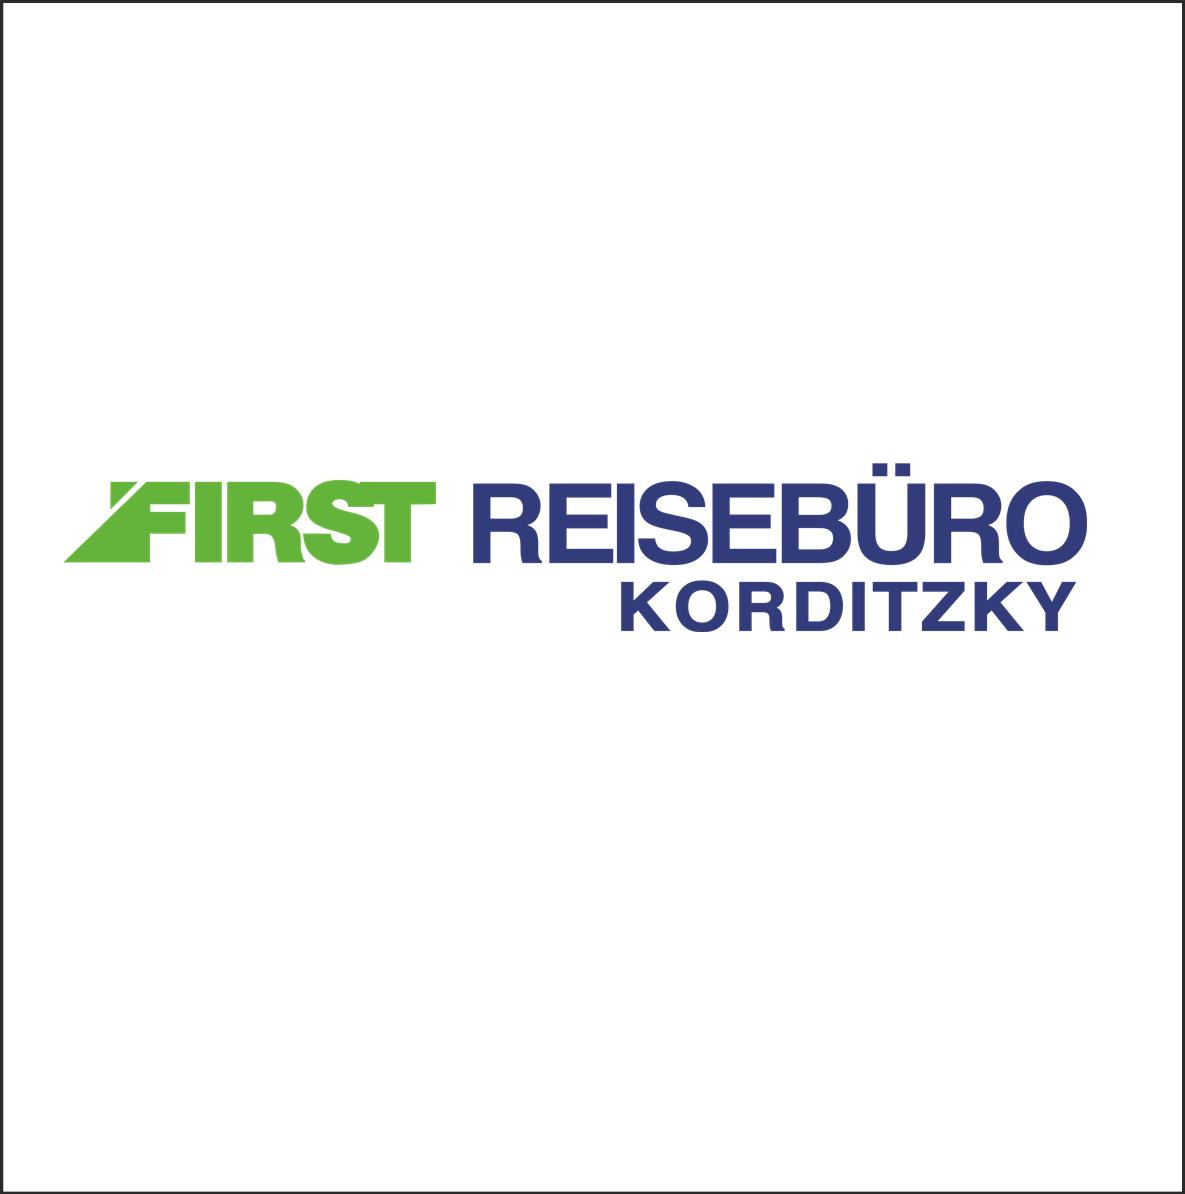 Reisebüro Korditzky